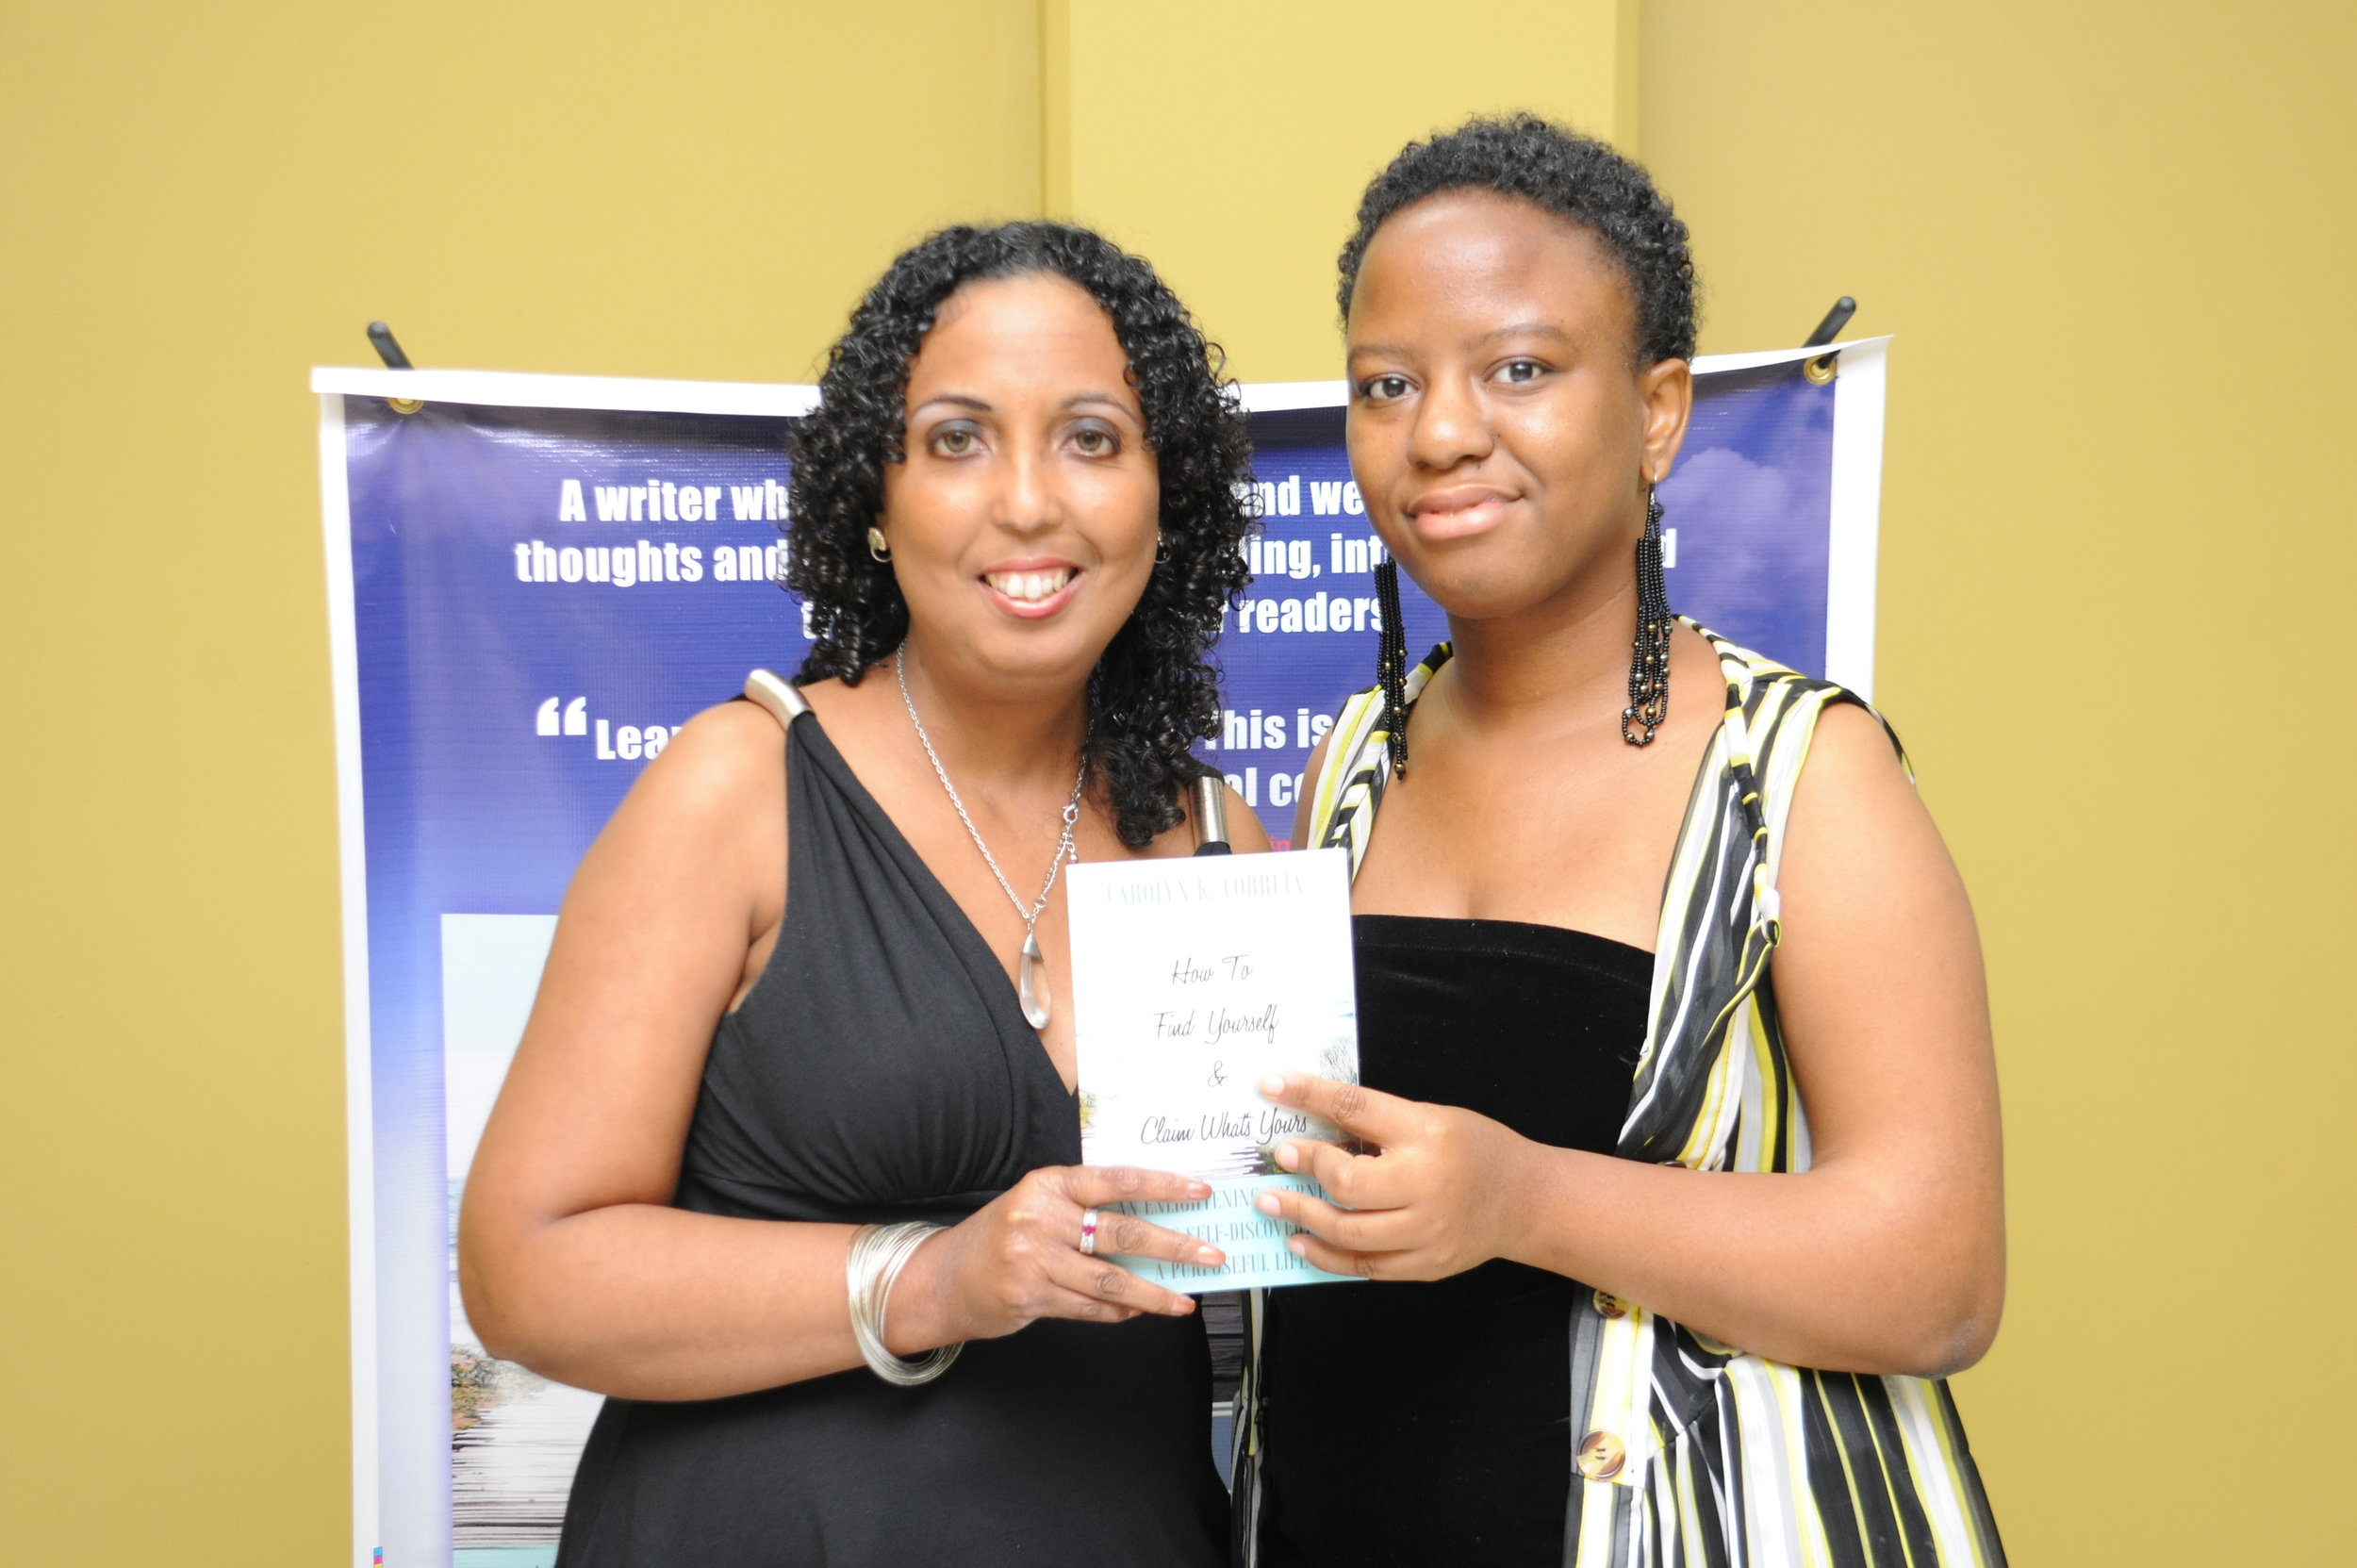 patricia grannum business entrepreneurship entrepreneur boss women boss inspire empower nyc werule we rule success role model.jpg